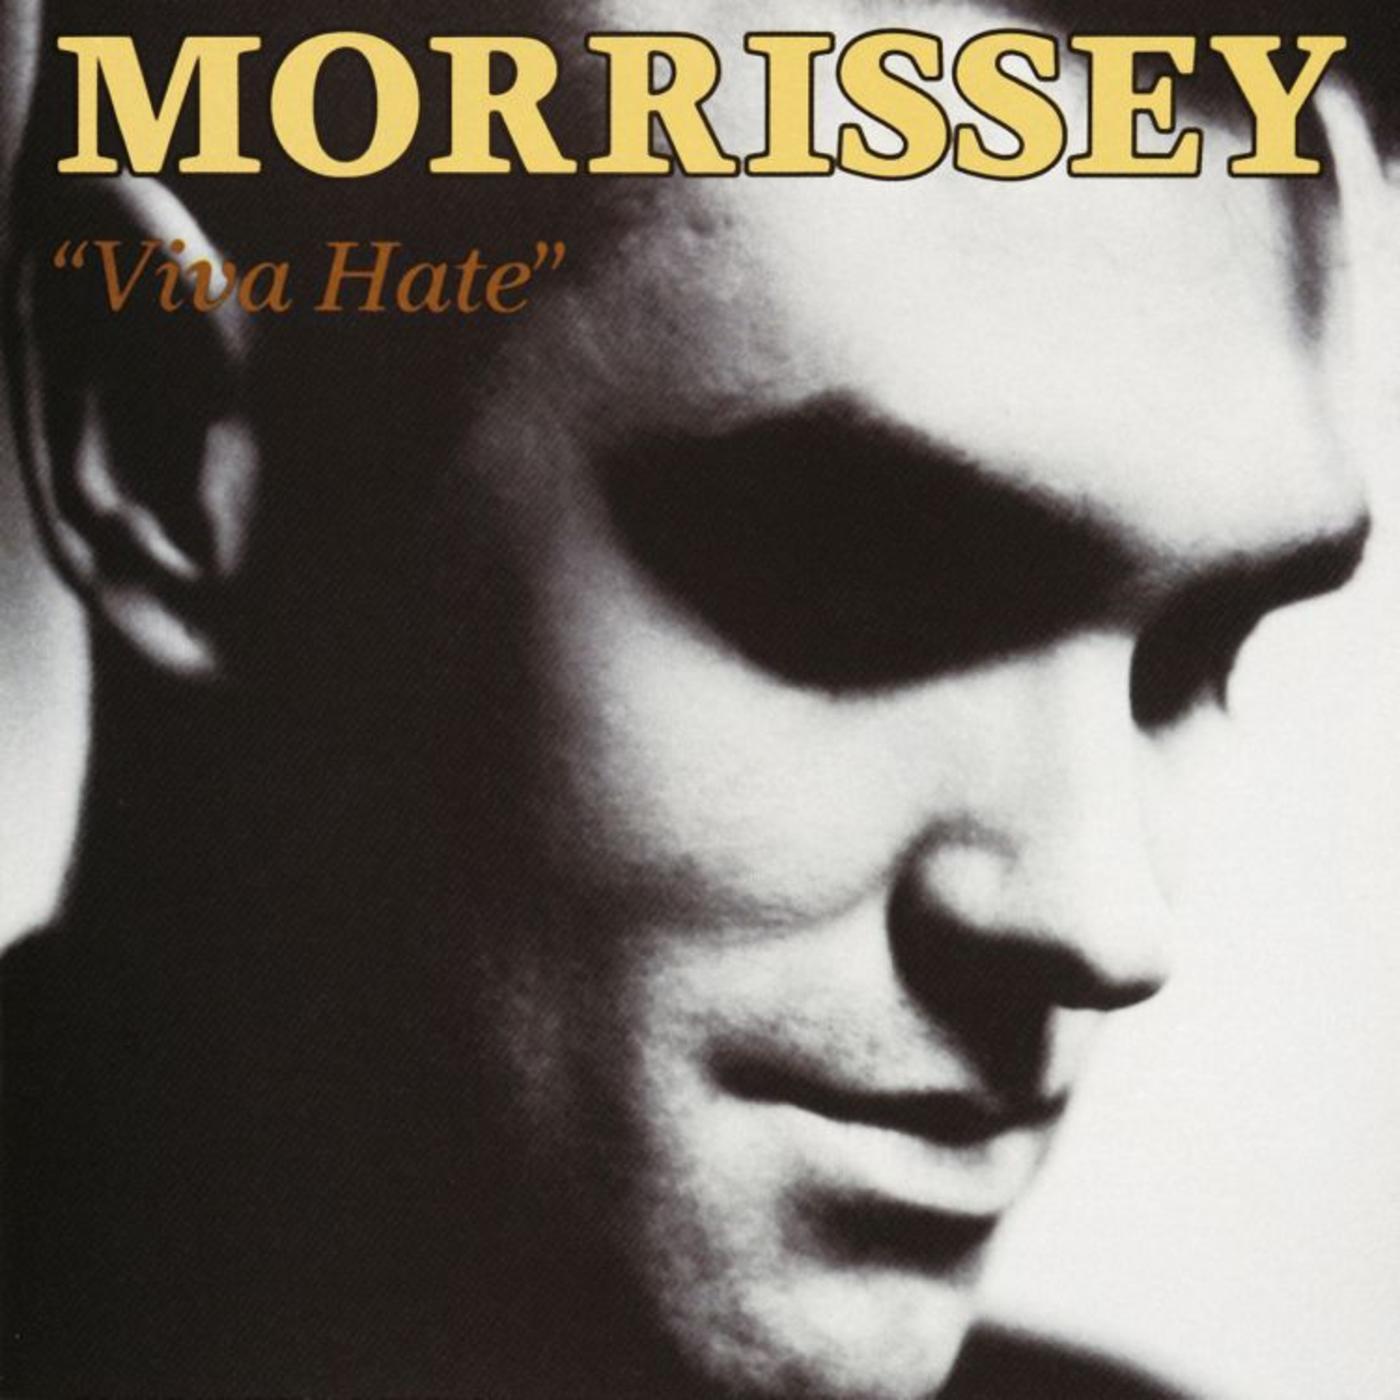 Morrissey_VivaHate.jpg